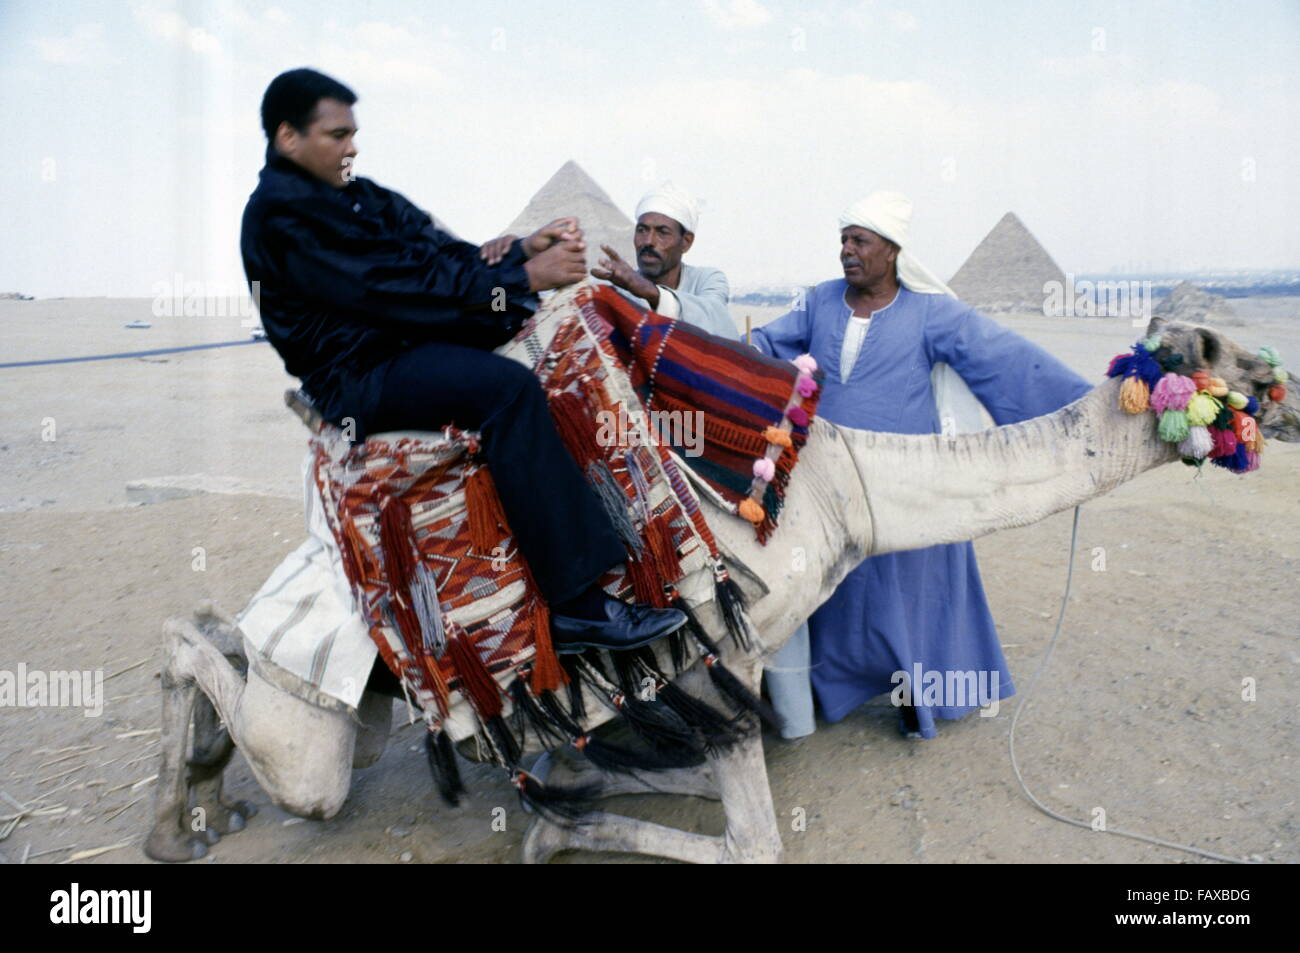 Giza Pyramids, Cairo, Egypt - 1986 - World heavyweight boxing champion Muhammad Ali on a goodwill visit to Egypt. - Stock Image